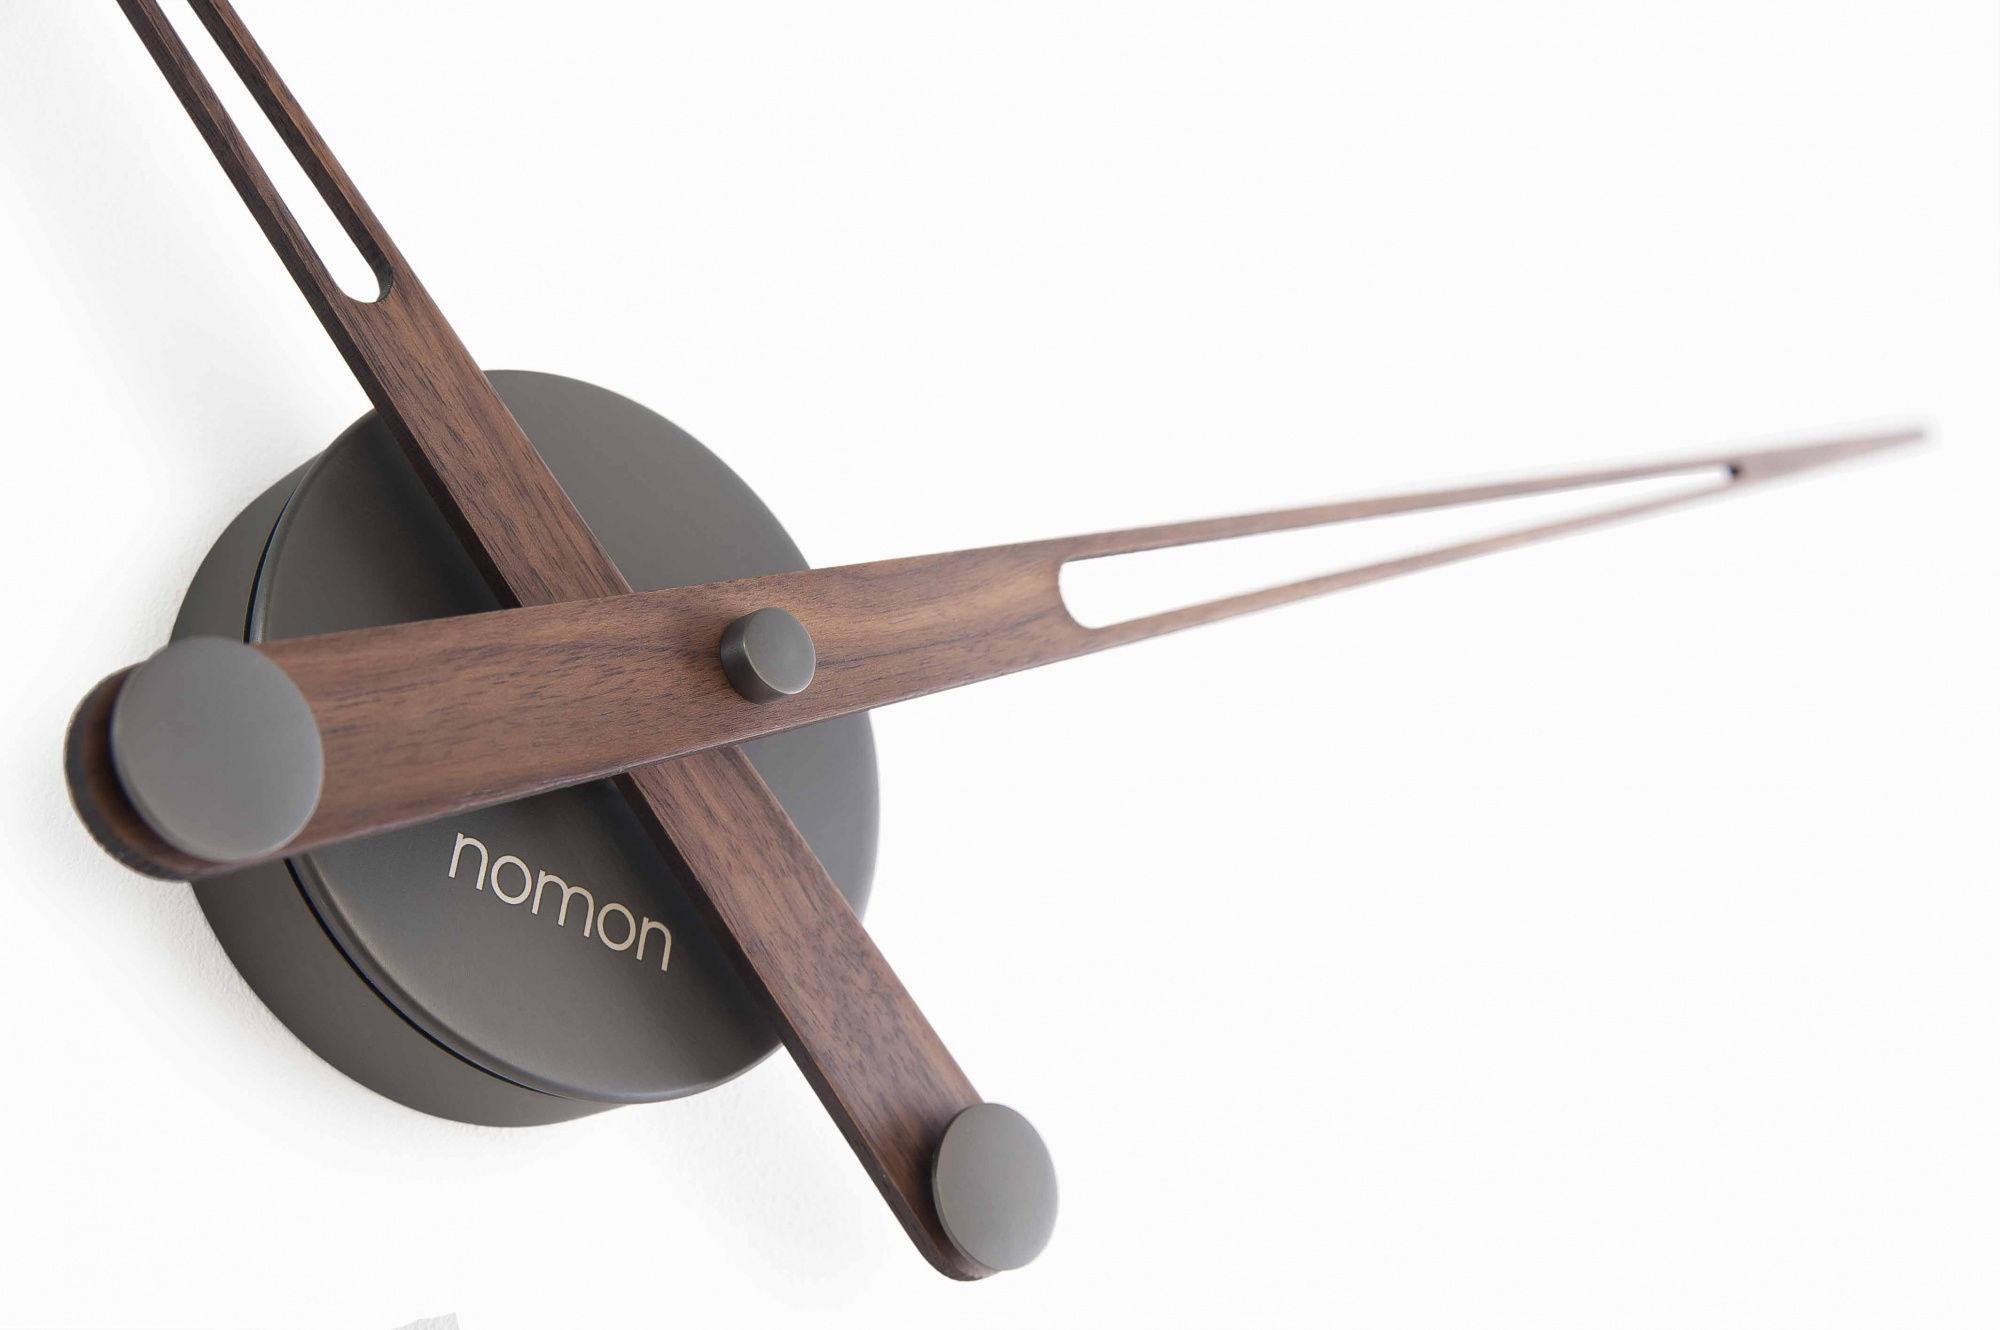 Zegar ścienny Axioma T Nomon różne rozmiary